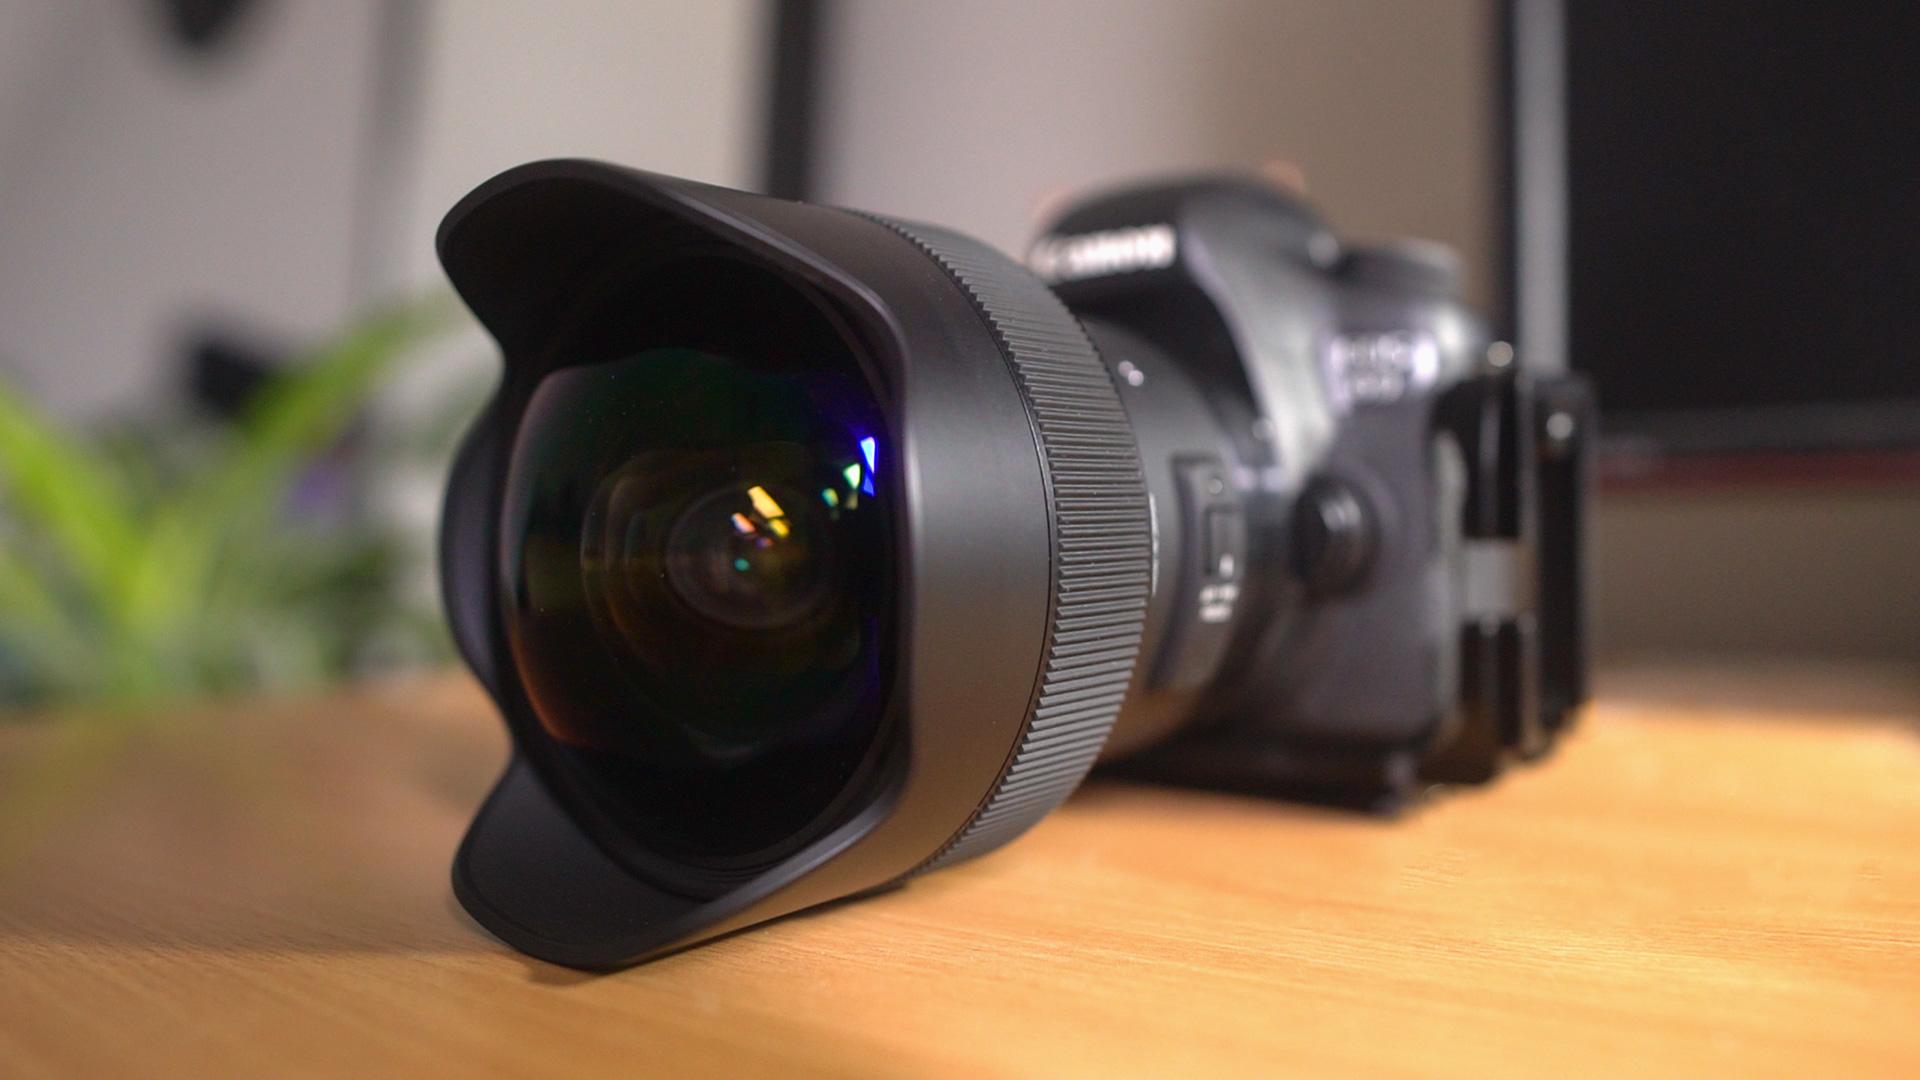 Lens-and-camera.jpg